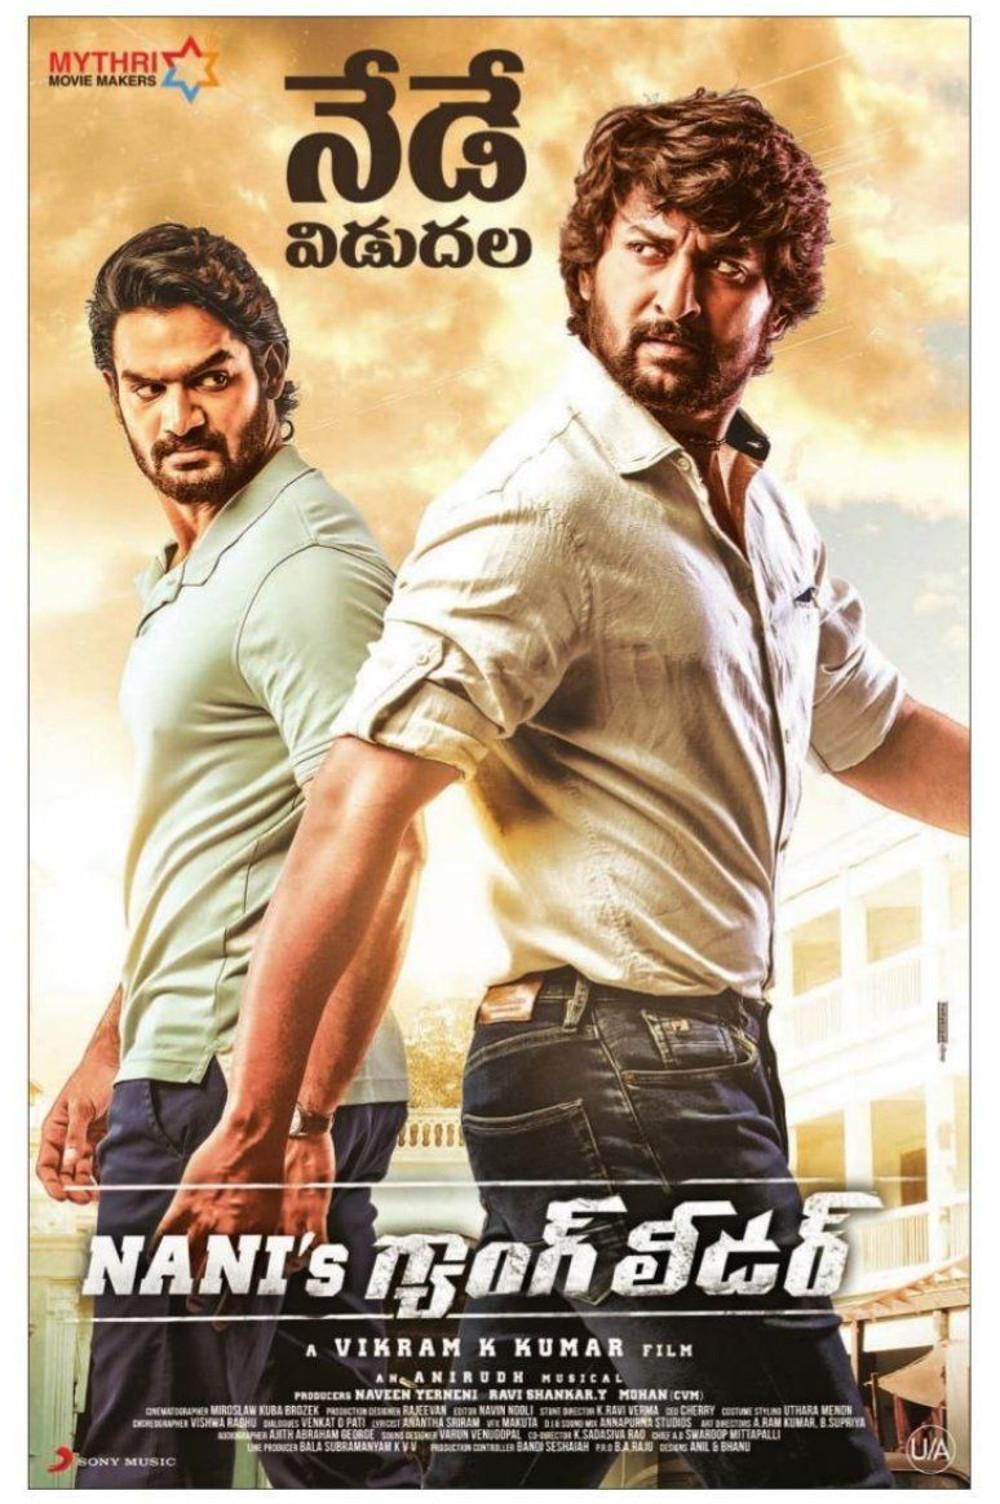 Karthikeya Nani Gang Leader Movie Release Today Poster HD